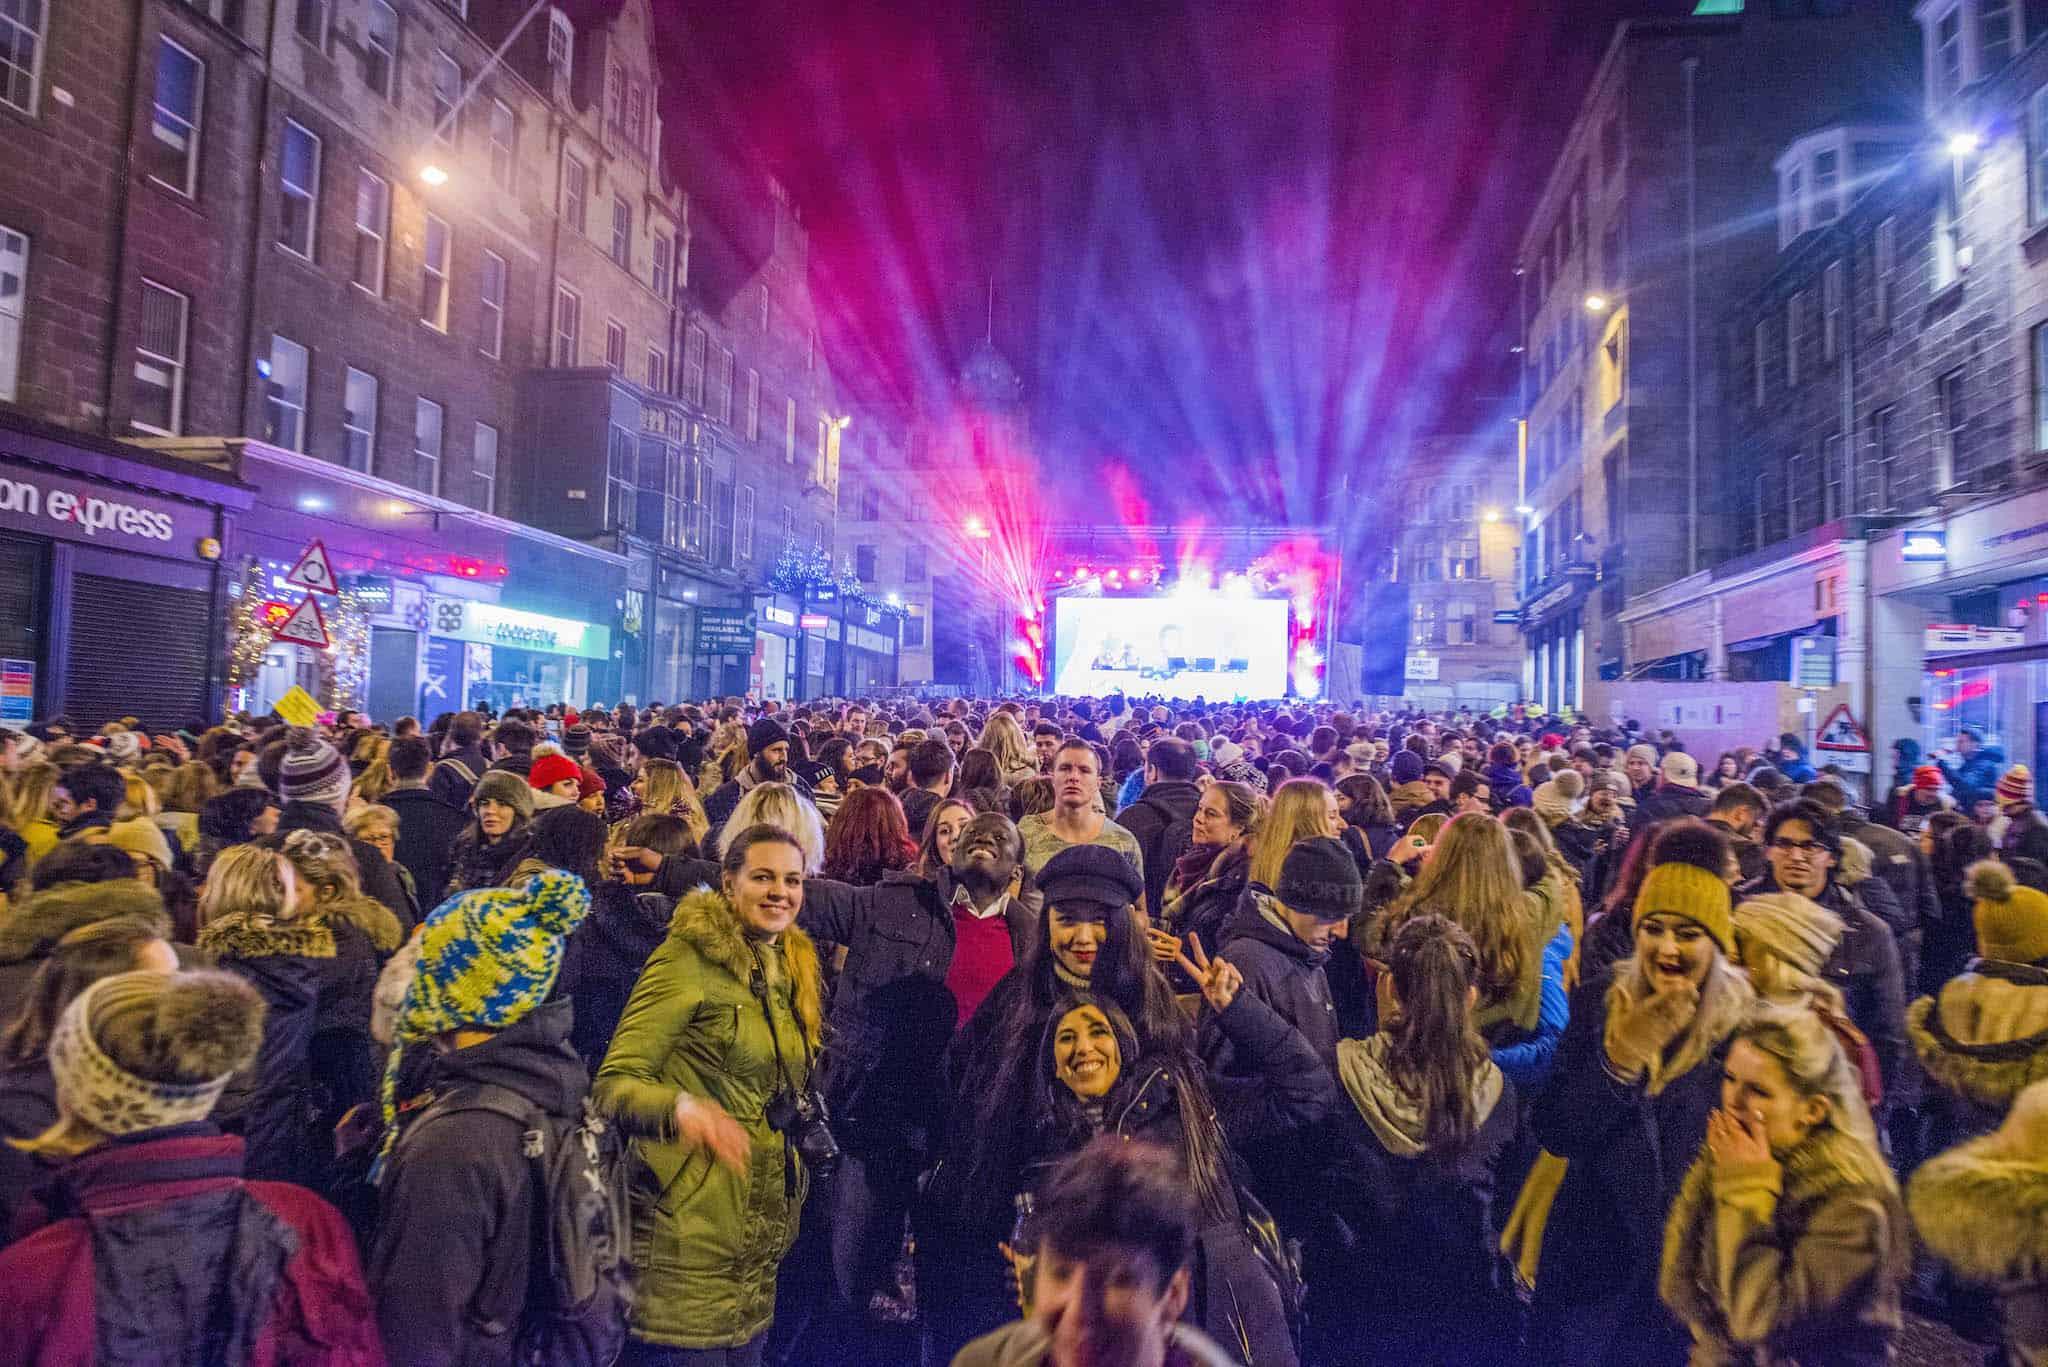 Edinburgh's Hogmanay - Street Party